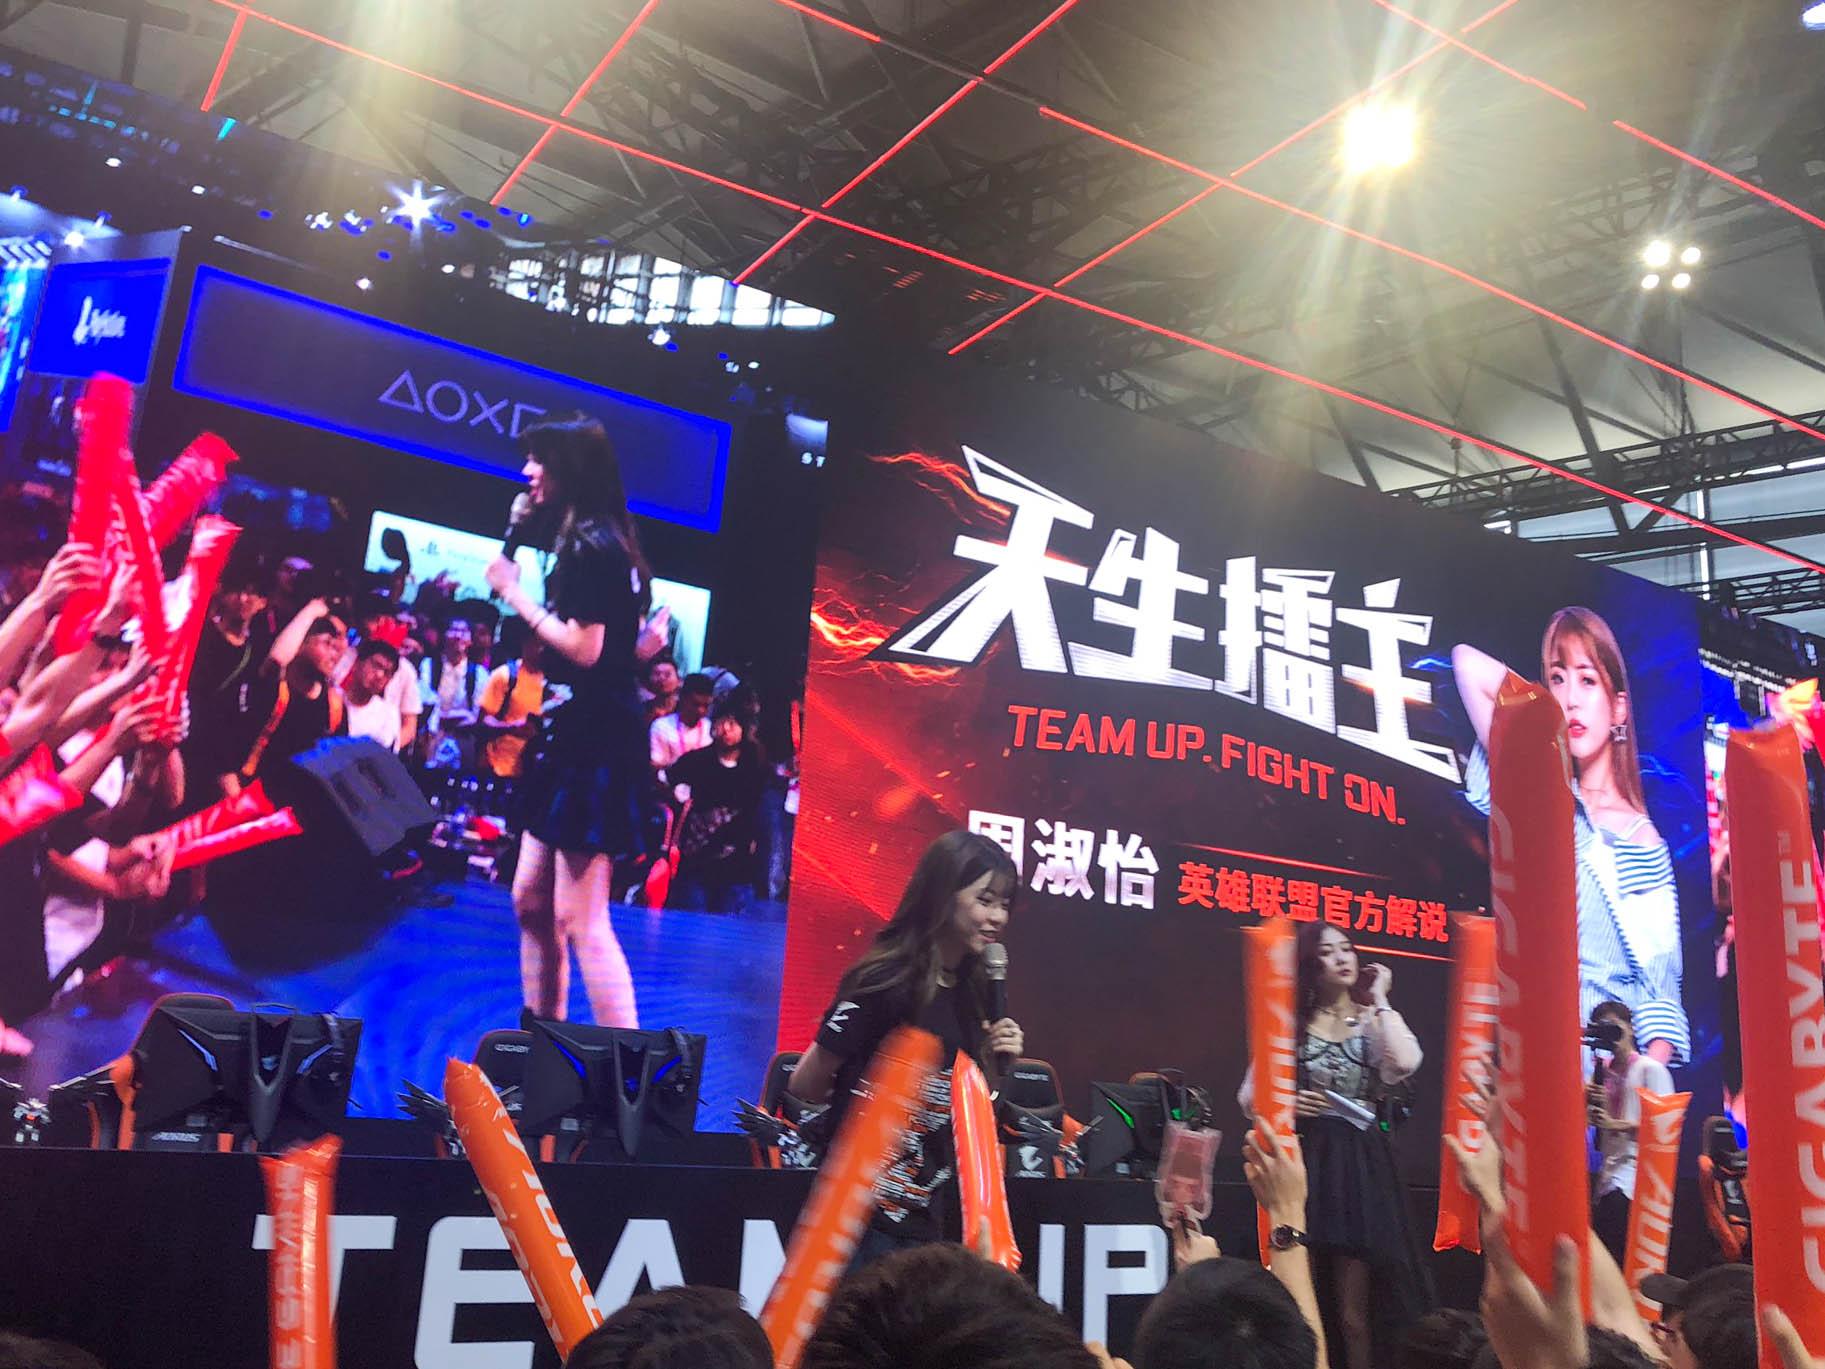 2019 ChinaJoy 中国国际数码互动娱乐展览会 游玩 第42张